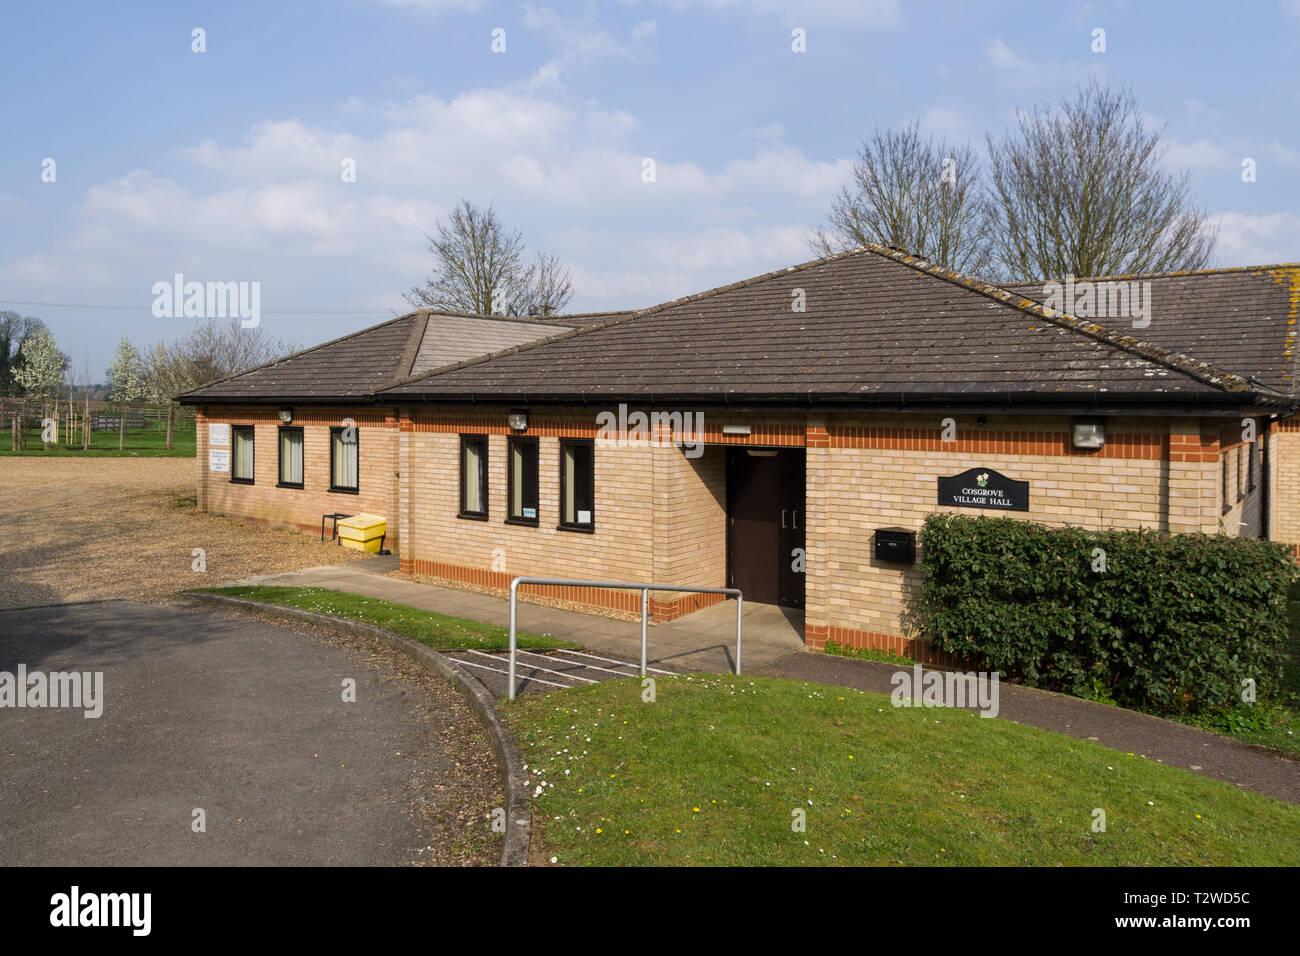 The village hall, Cosgrove, Northamptonshire, UK - Stock Image